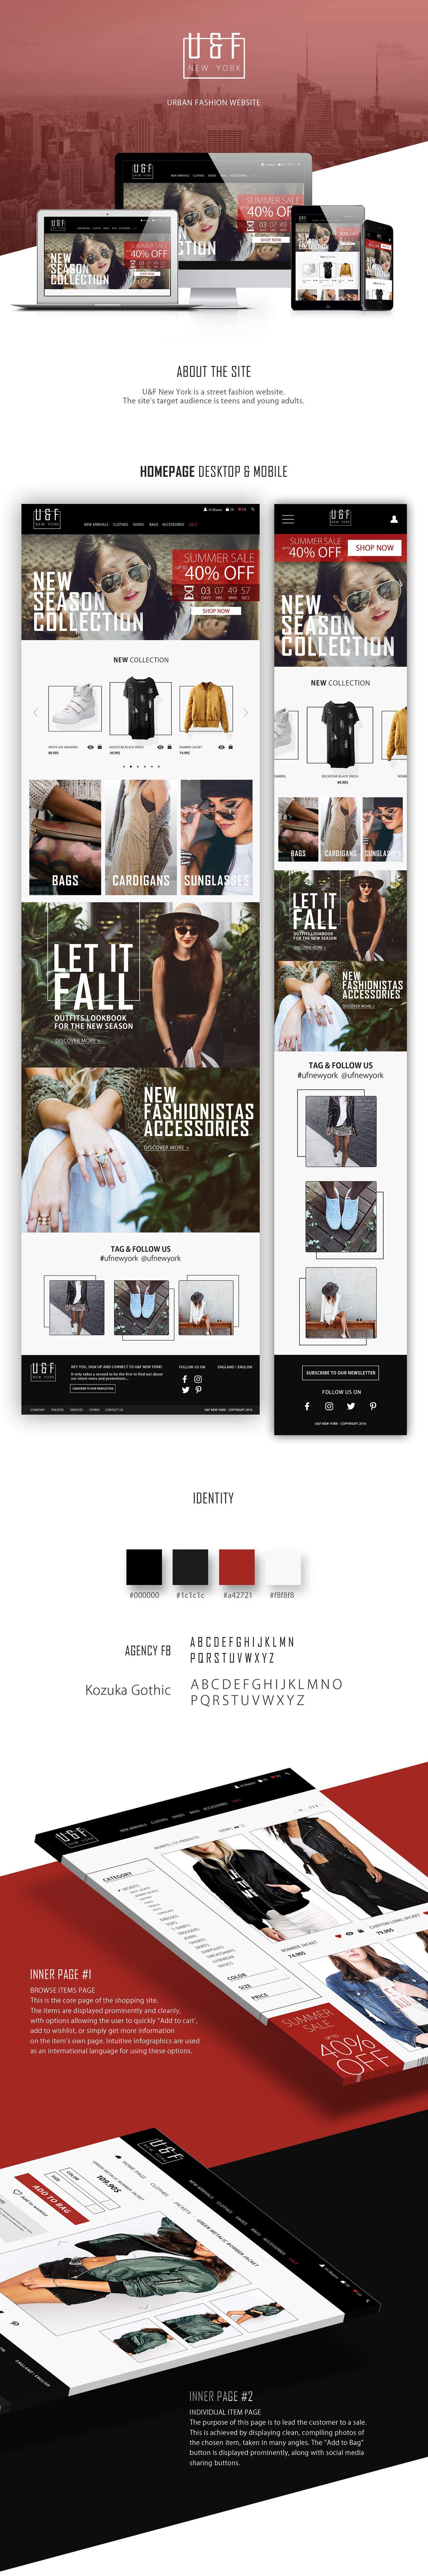 Fashion  UI ux Web Design  Marketing Design Responsive Design interactive design Urban Modern Design